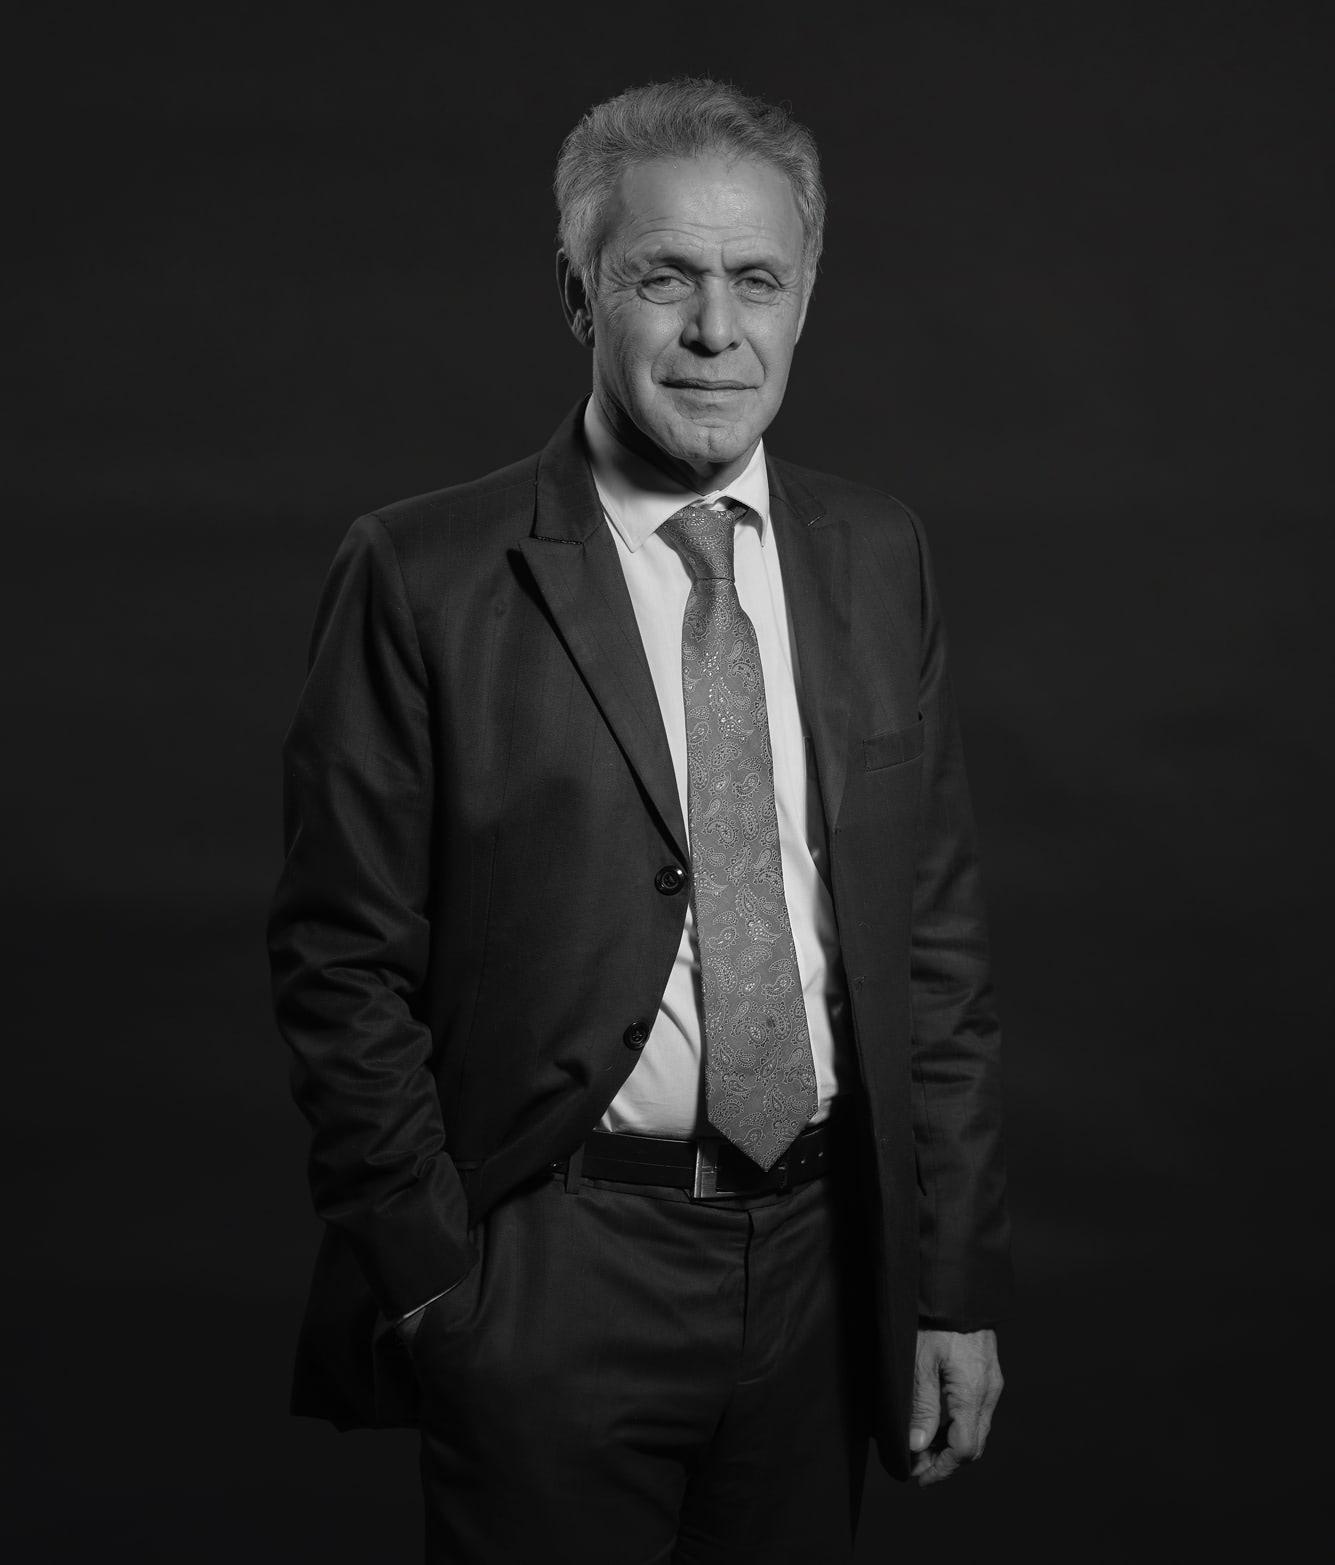 Mohammed Bhabha